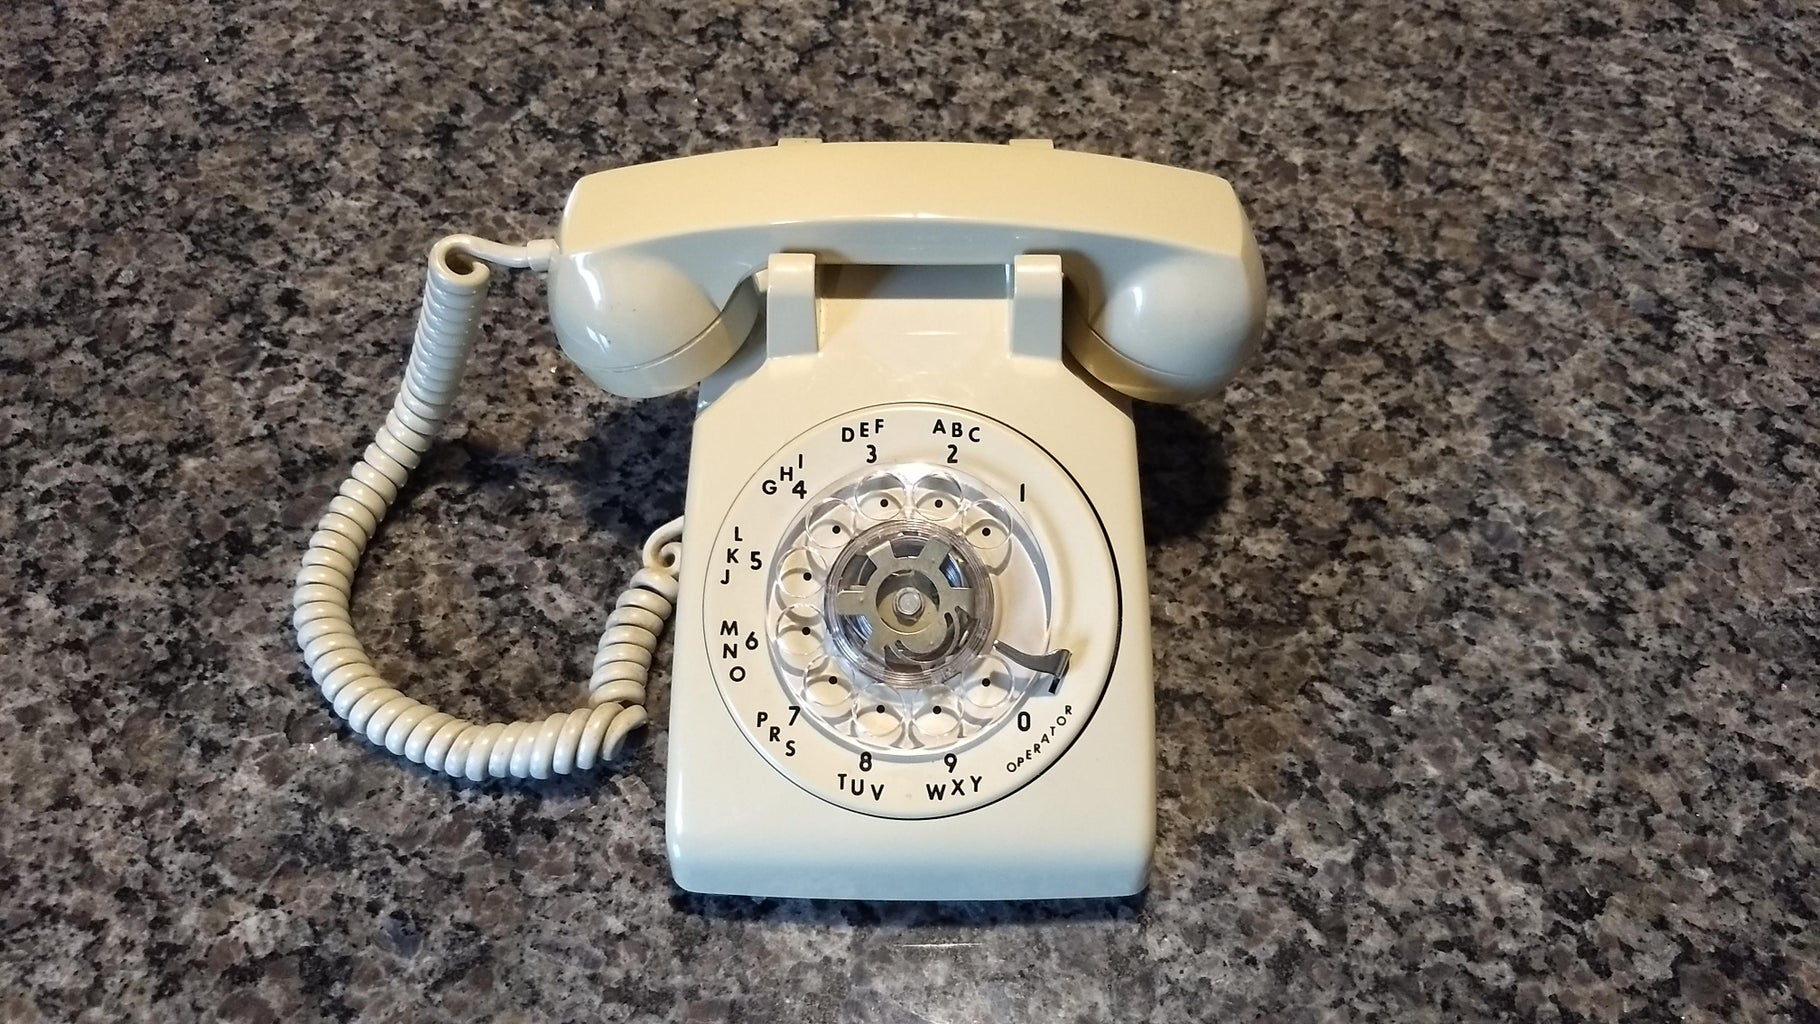 Raspberry Pi Rotary Phone Case